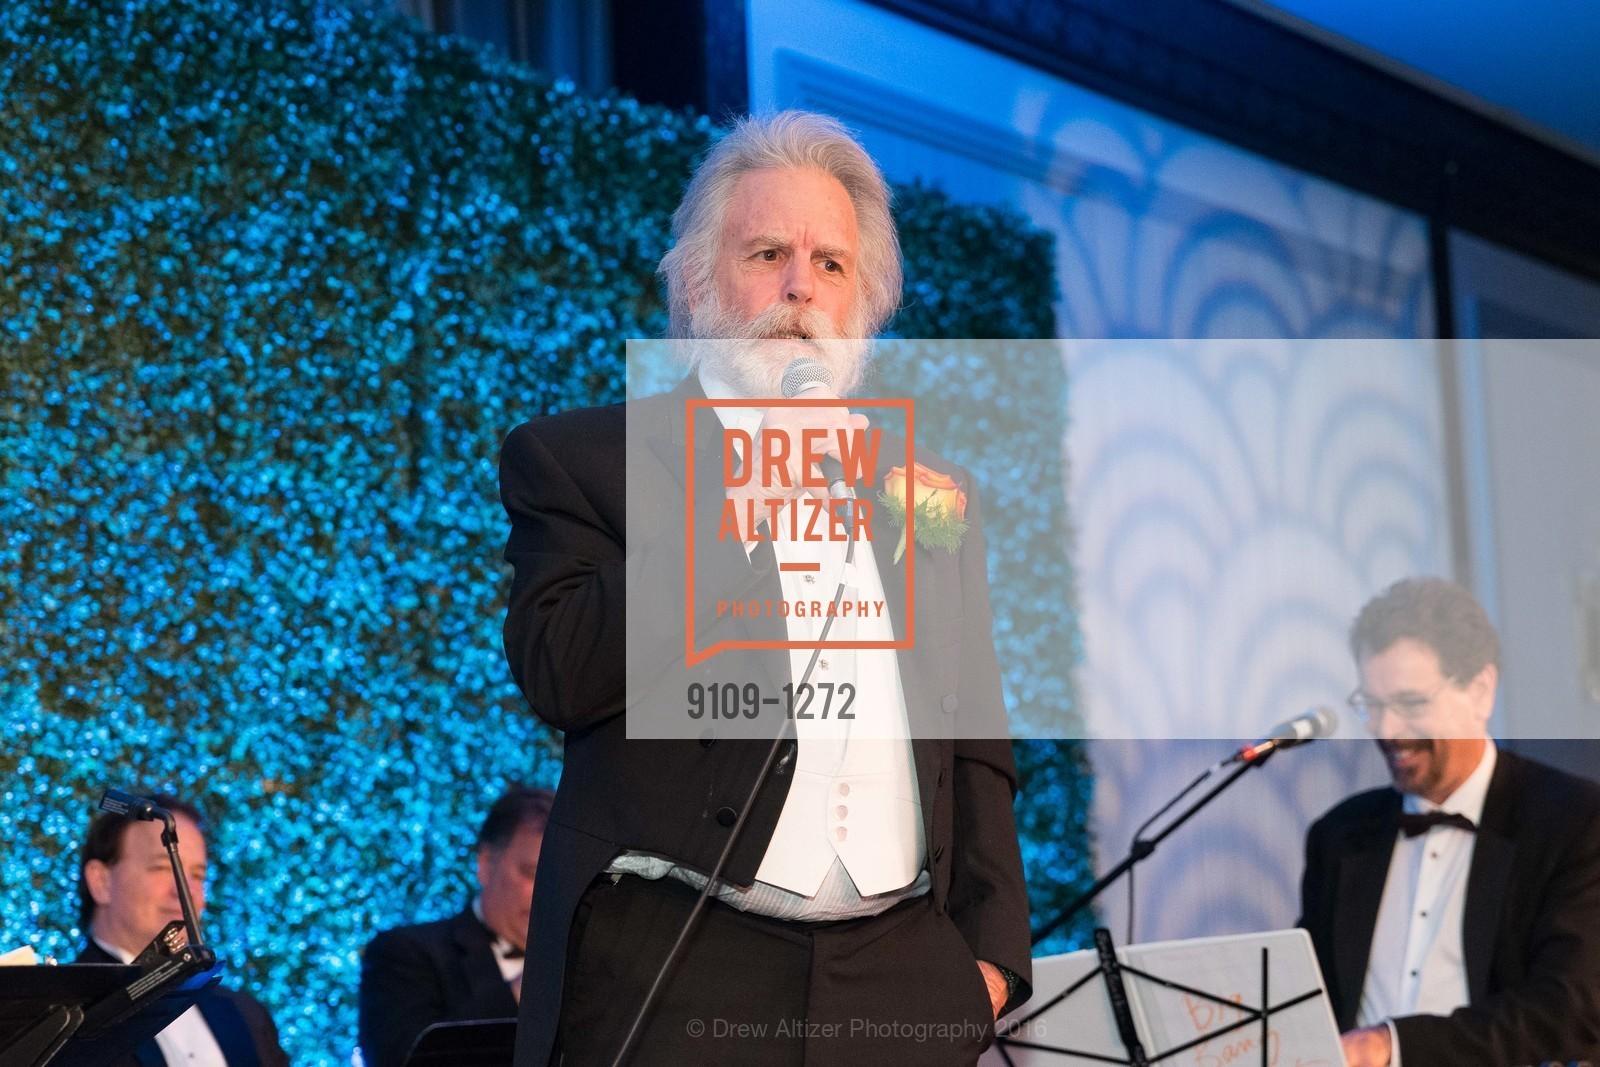 Bob Weir, Photo #9109-1272